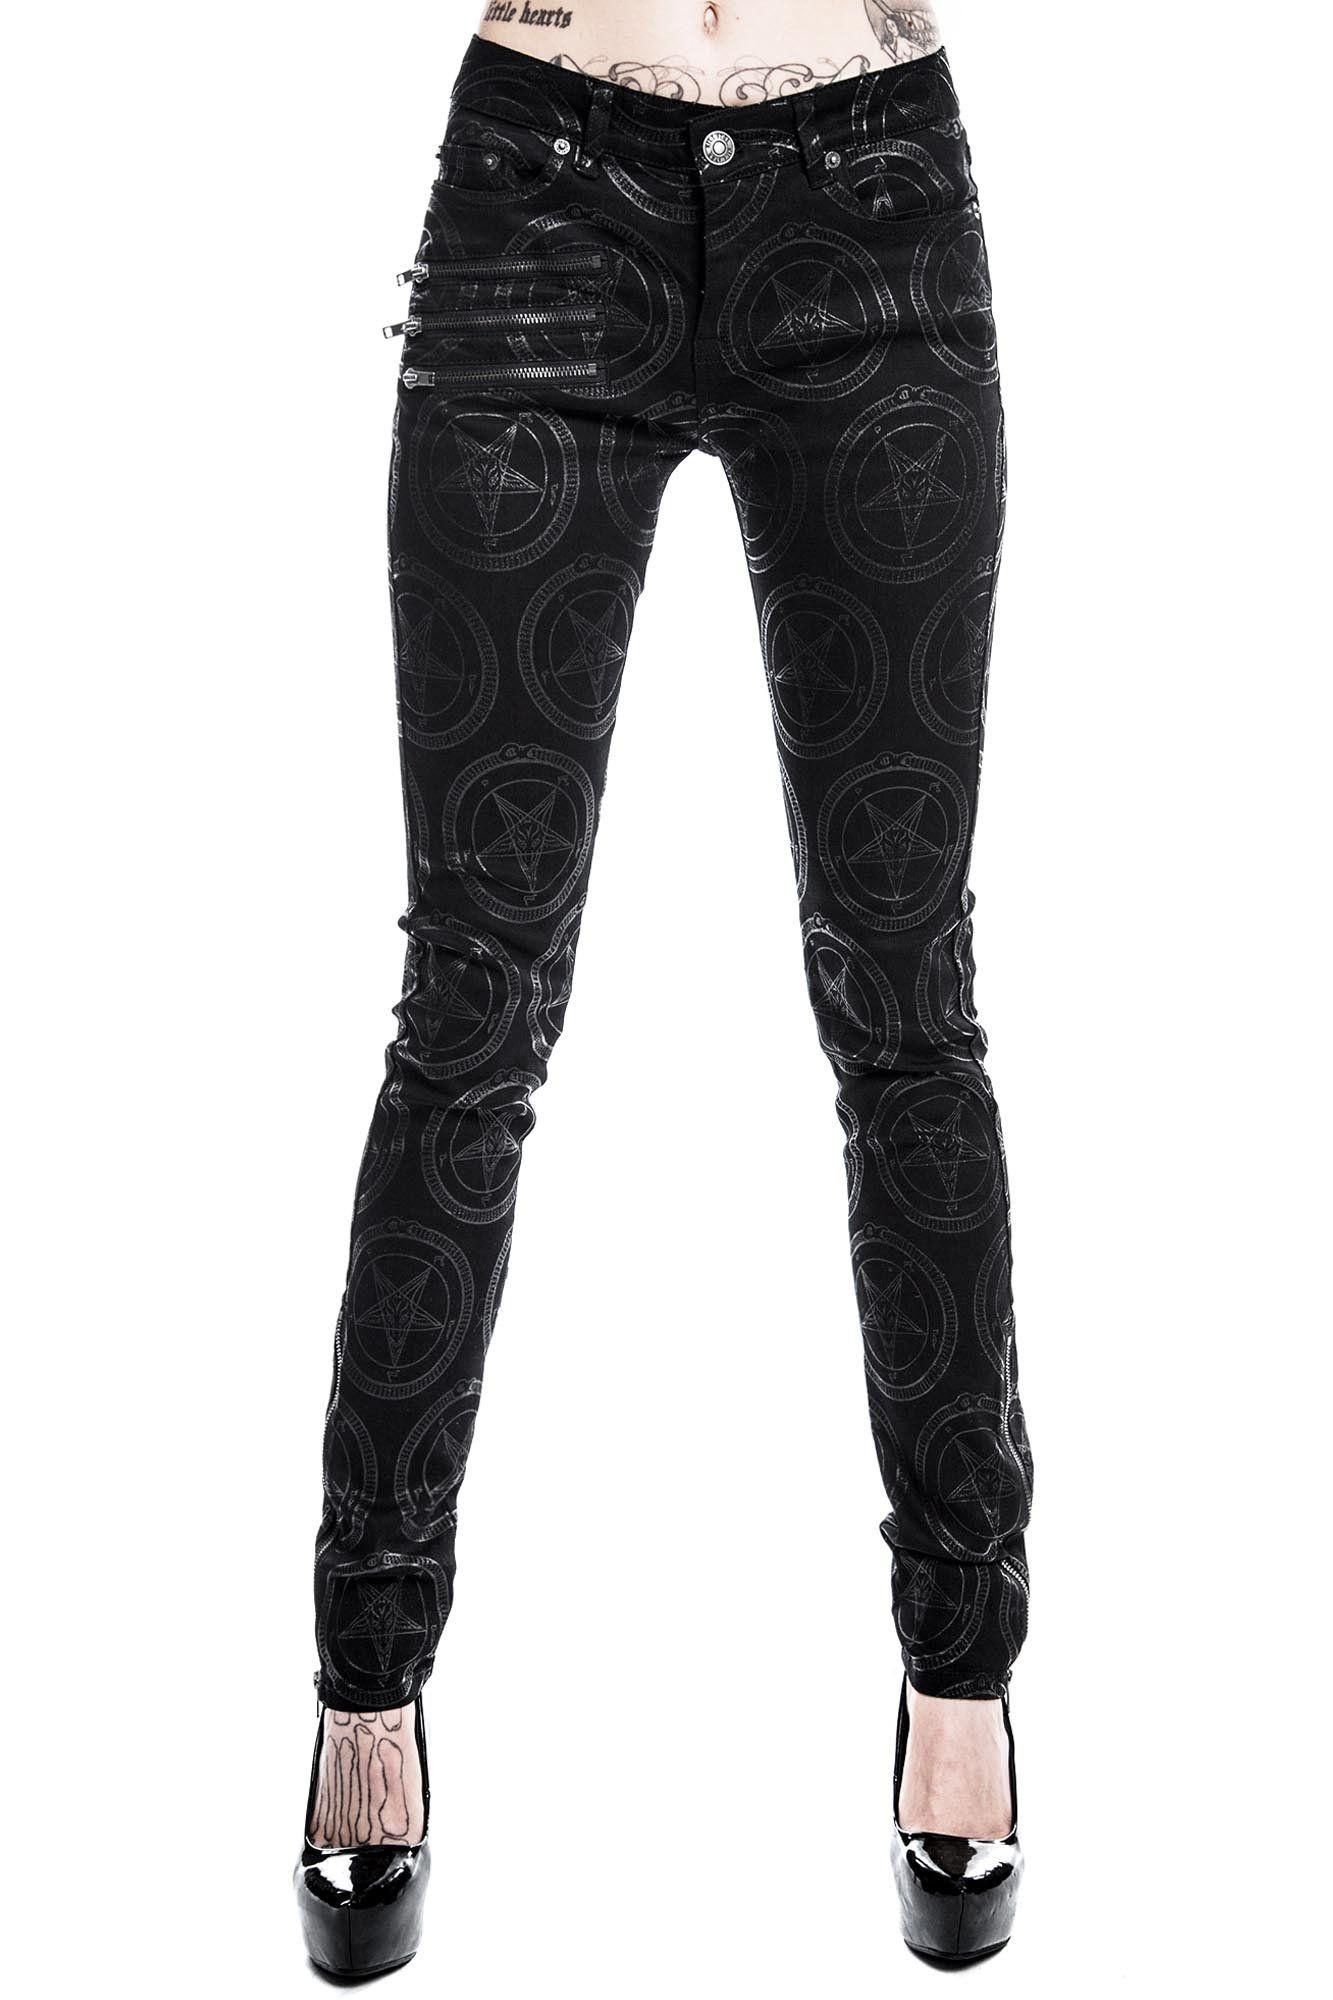 ks1872_pantalon-gothique-glam-rock-slim-baphomet-speed